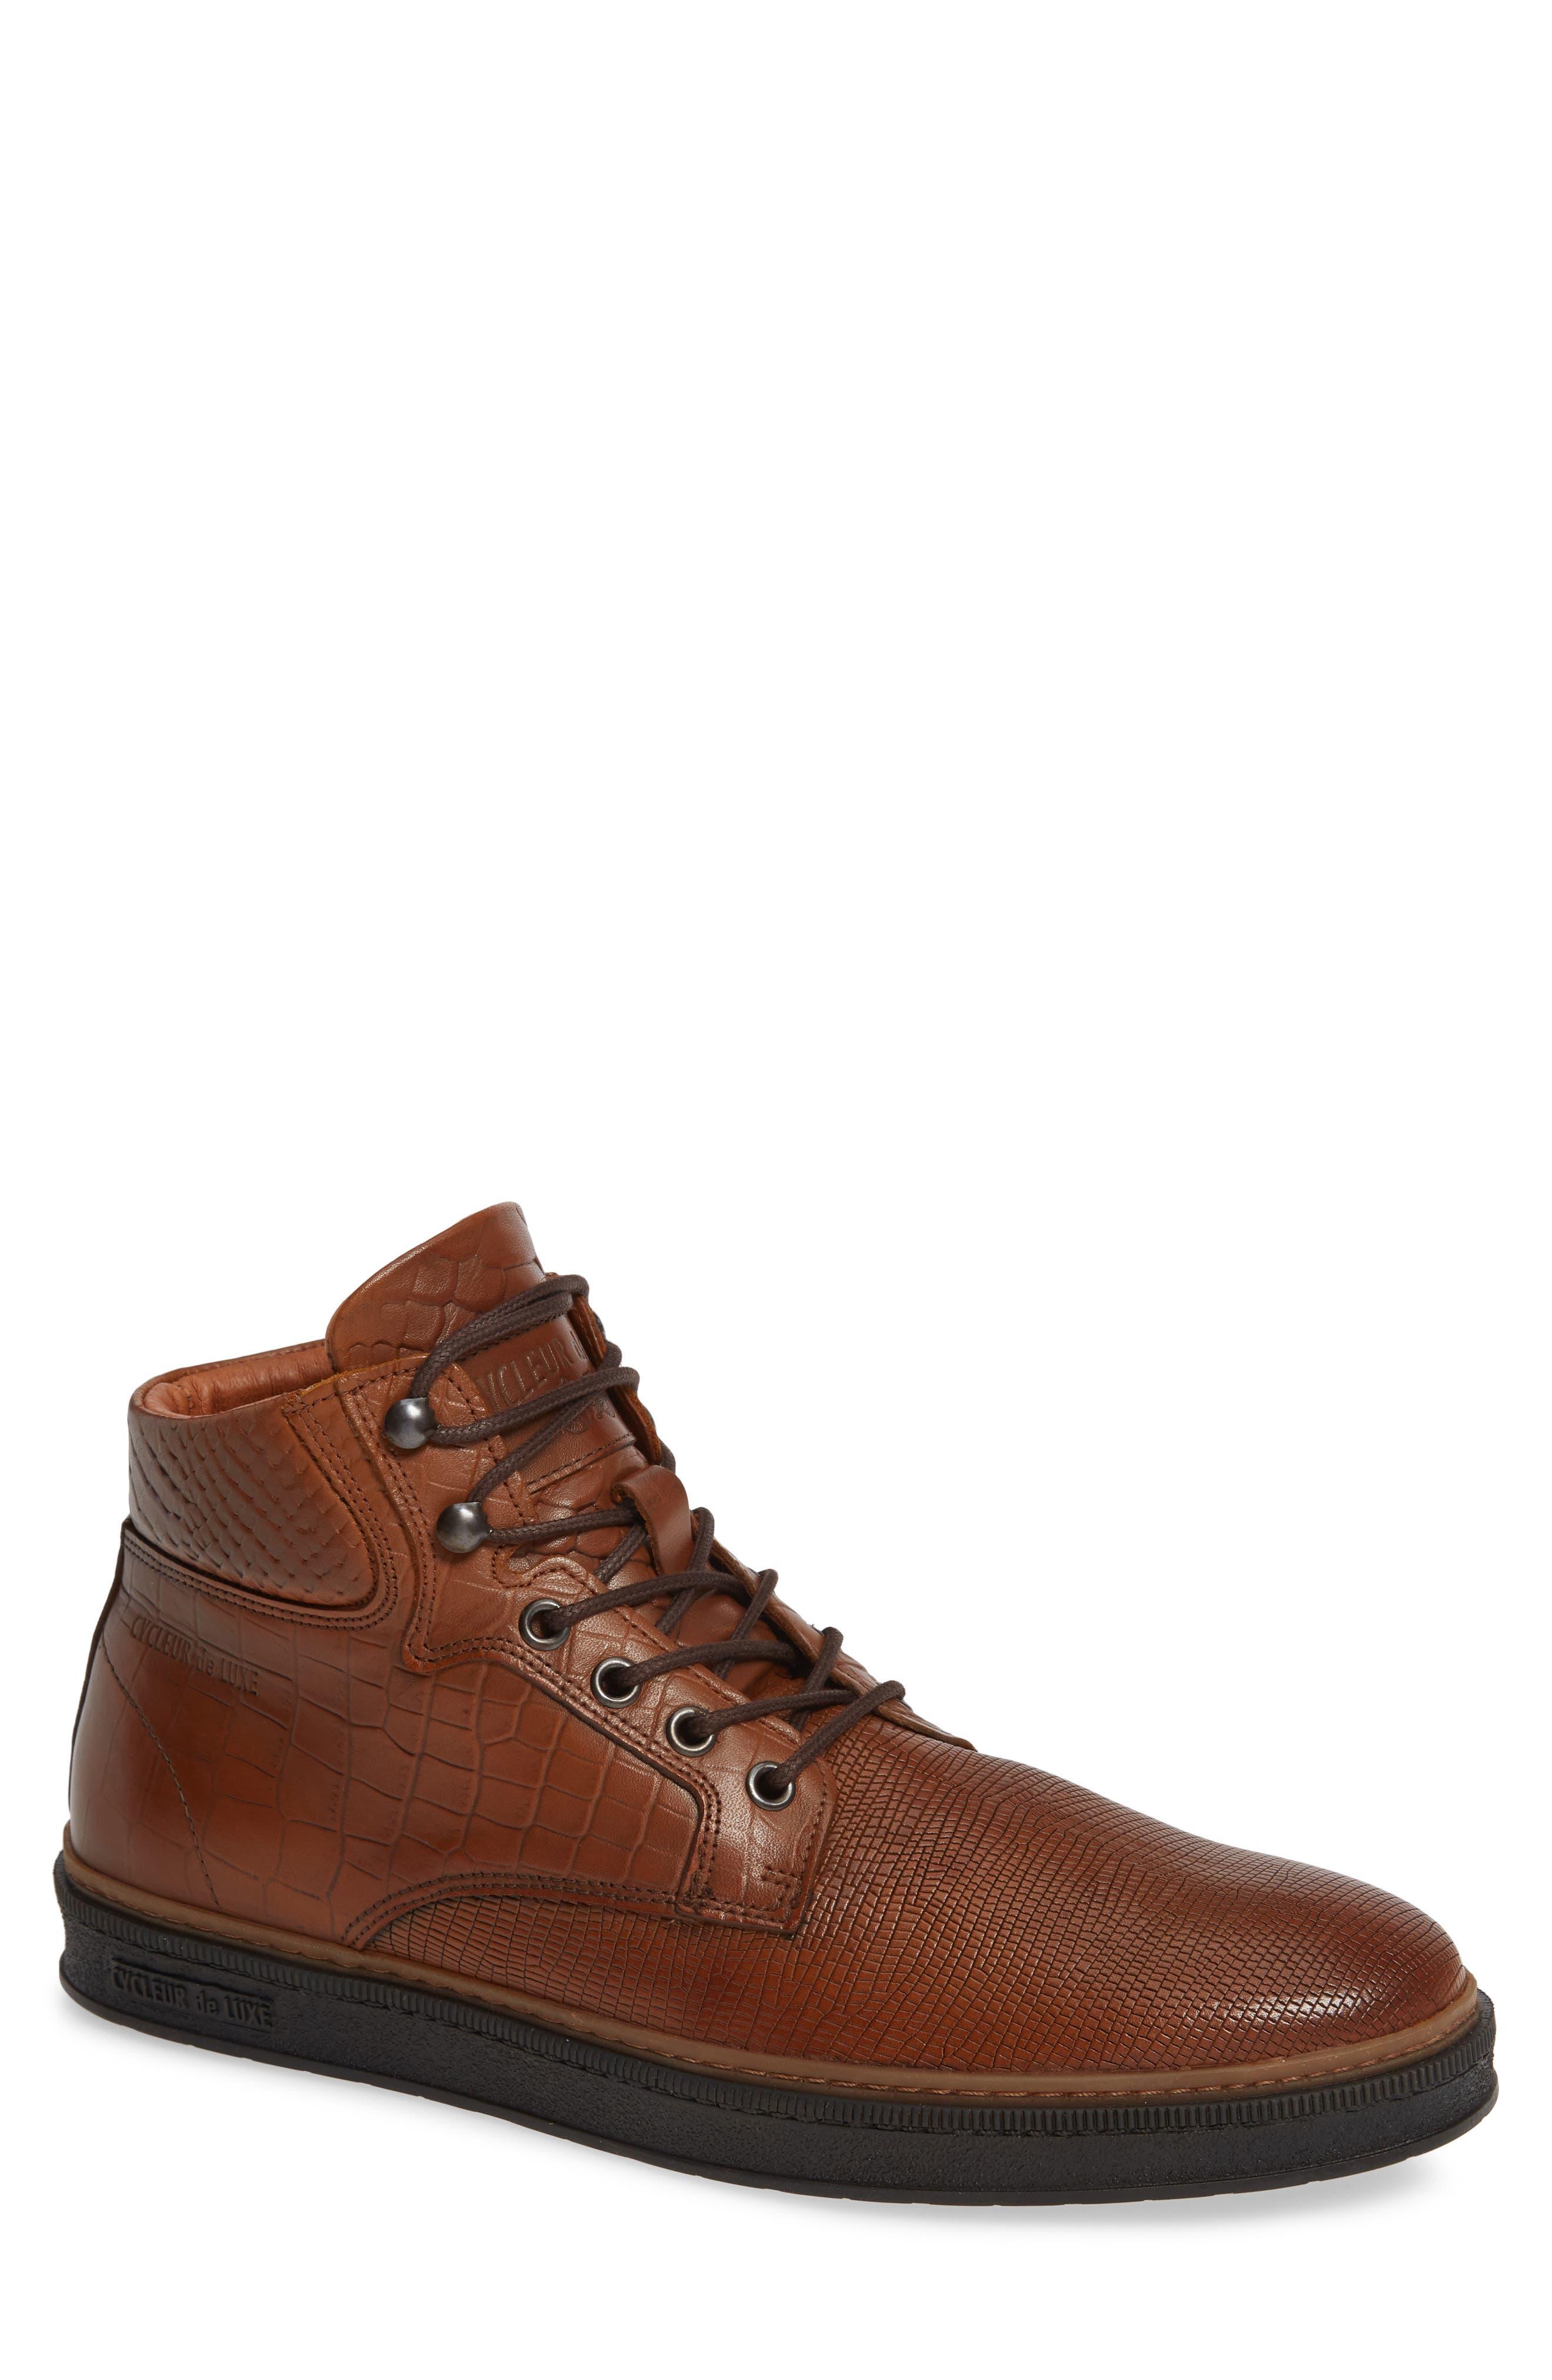 Lissabon Sneaker,                         Main,                         color, DARK COGNAC